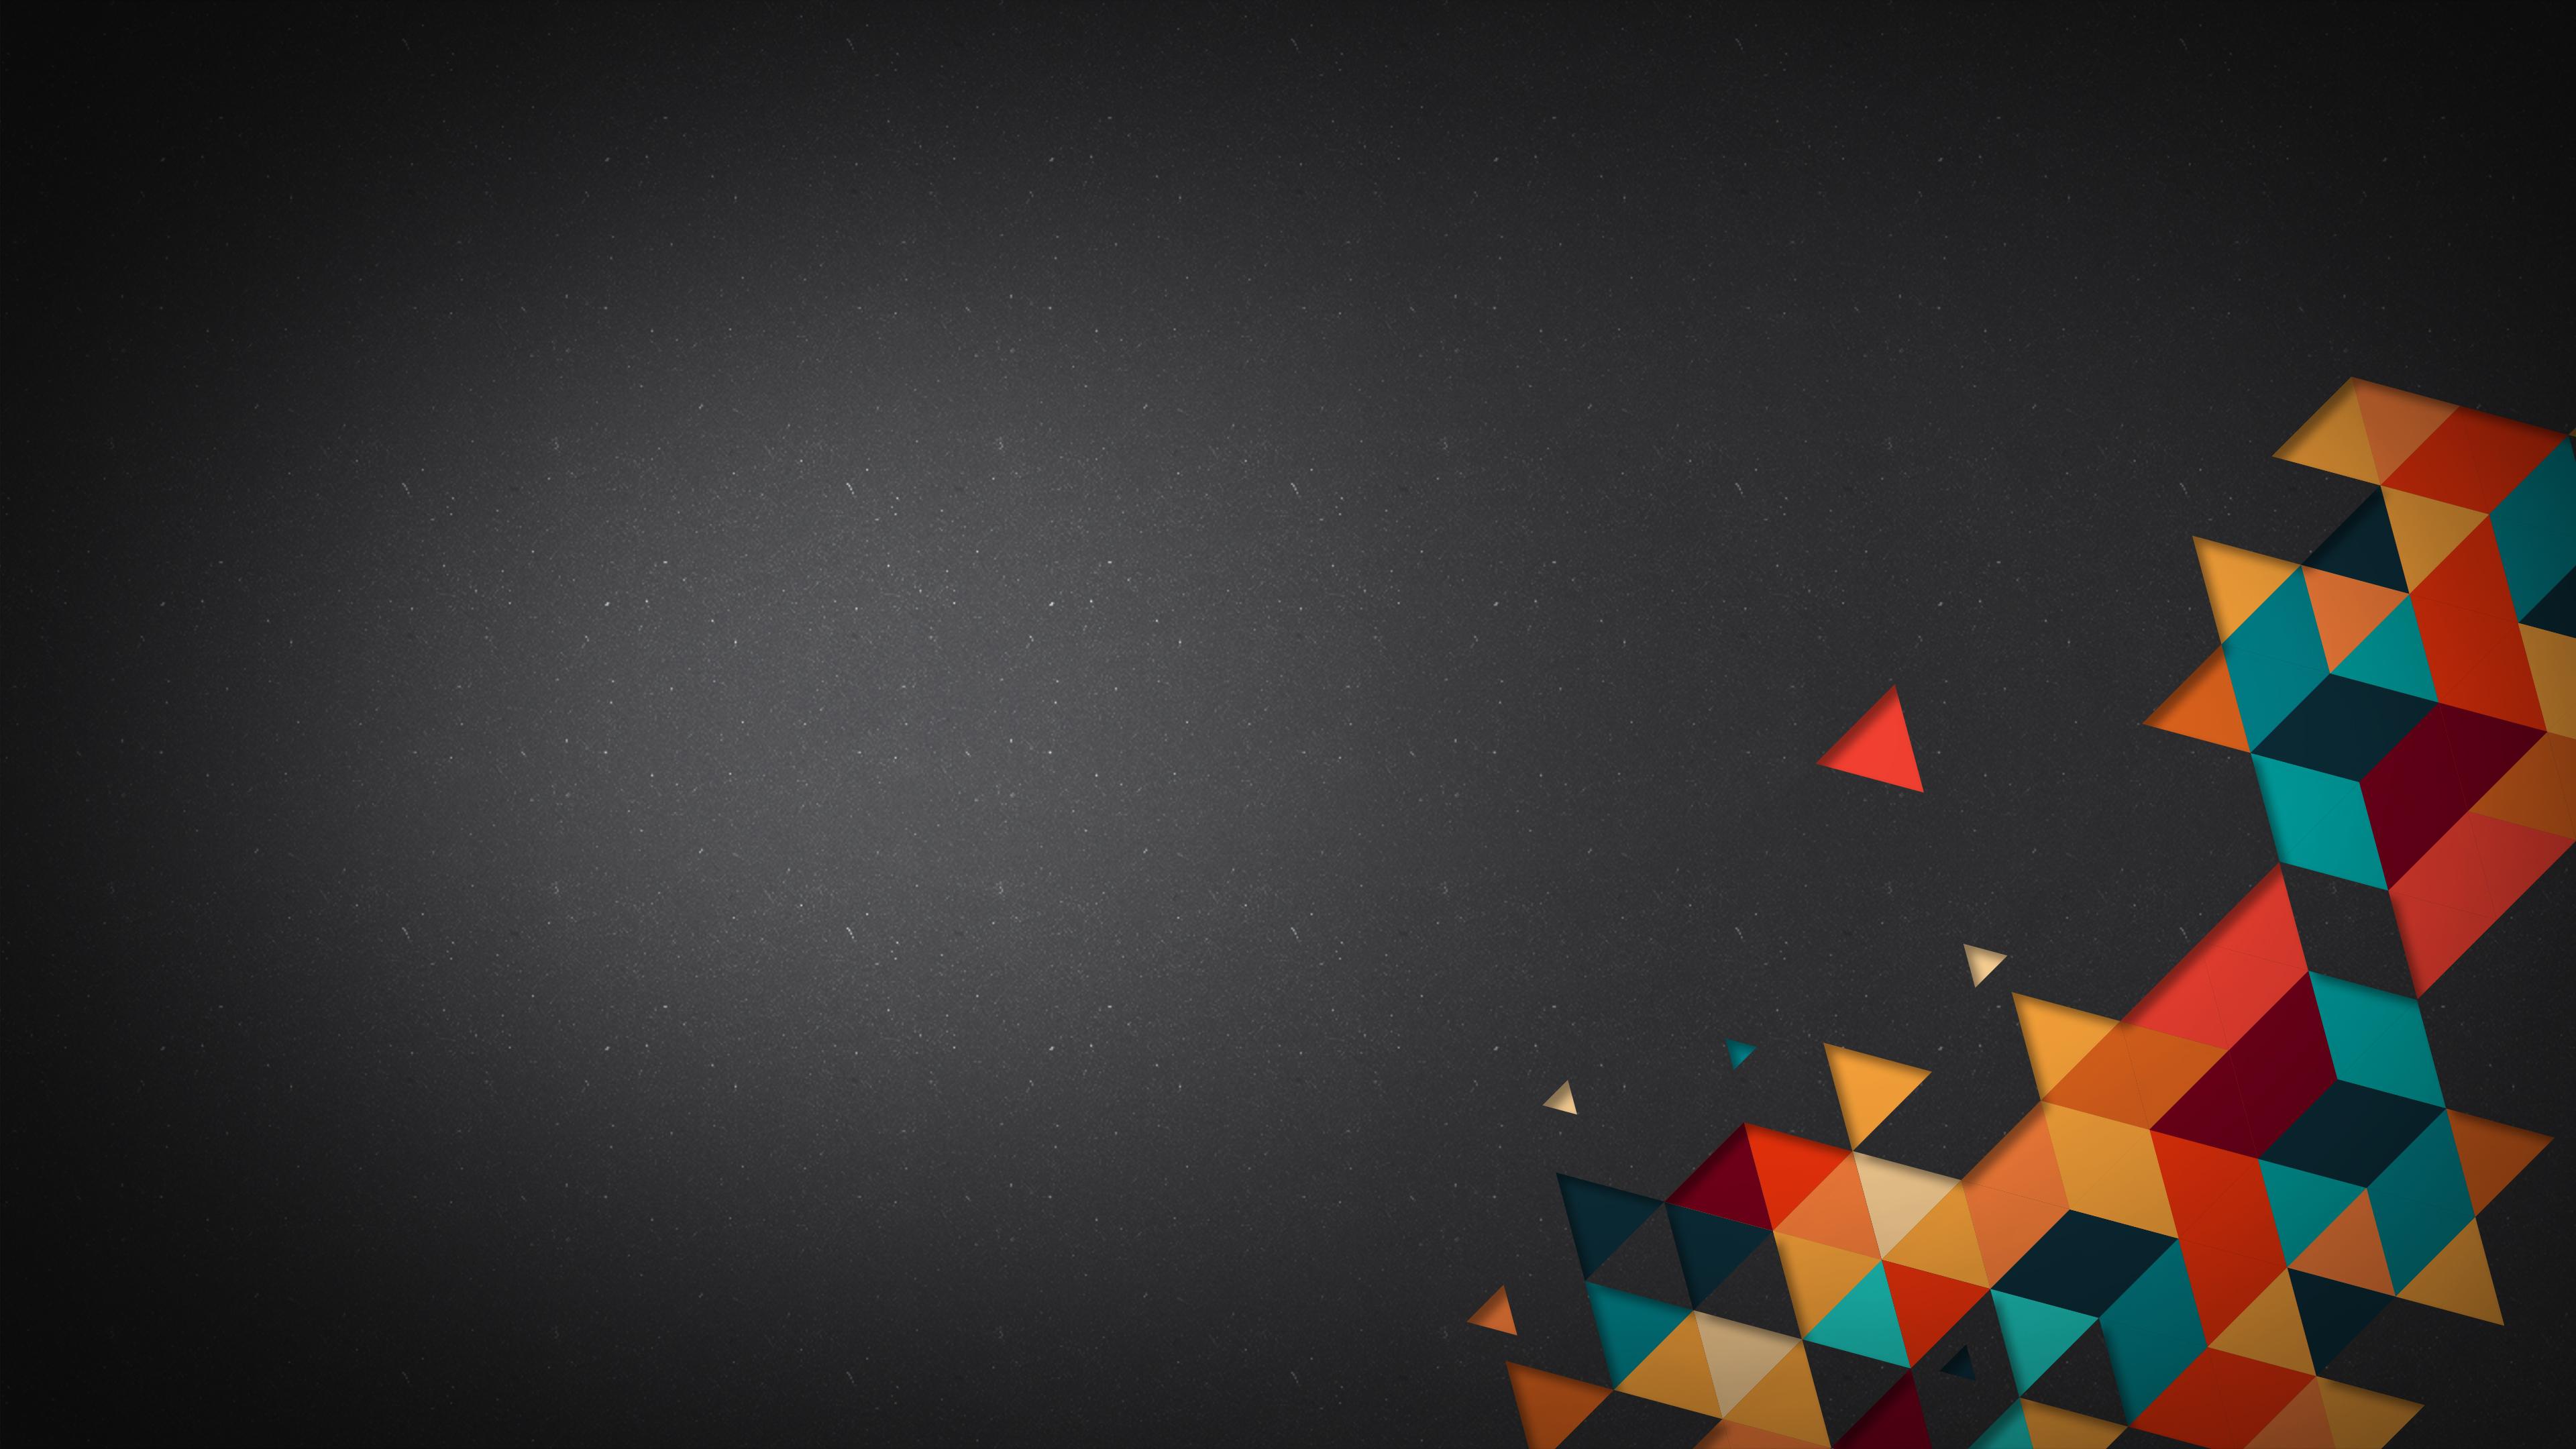 polygon shapes dark 4k 1620165378 - Polygon Shapes Dark 4k - Polygon Shapes Dark 4k wallpapers